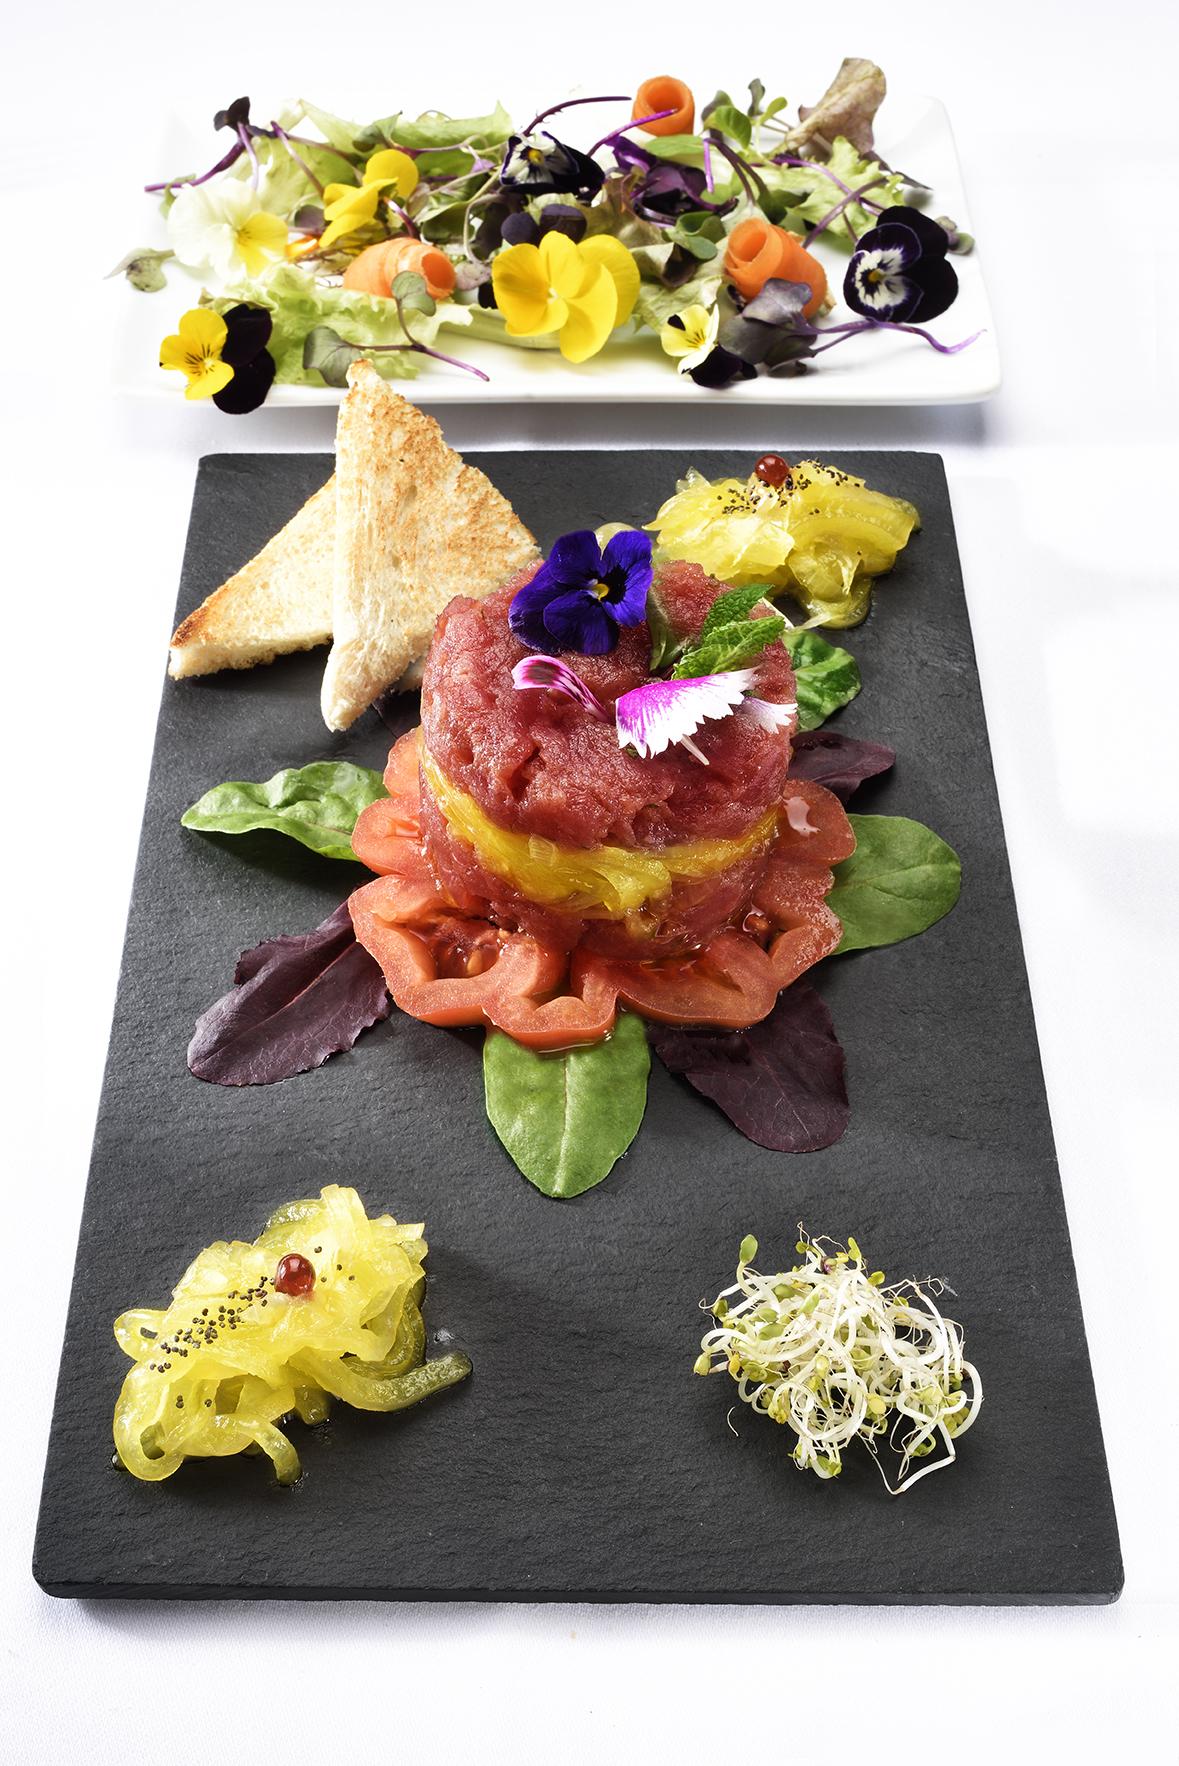 http://sandrorestaurante.com/wp-content/uploads/2017/01/piatto-089.jpg